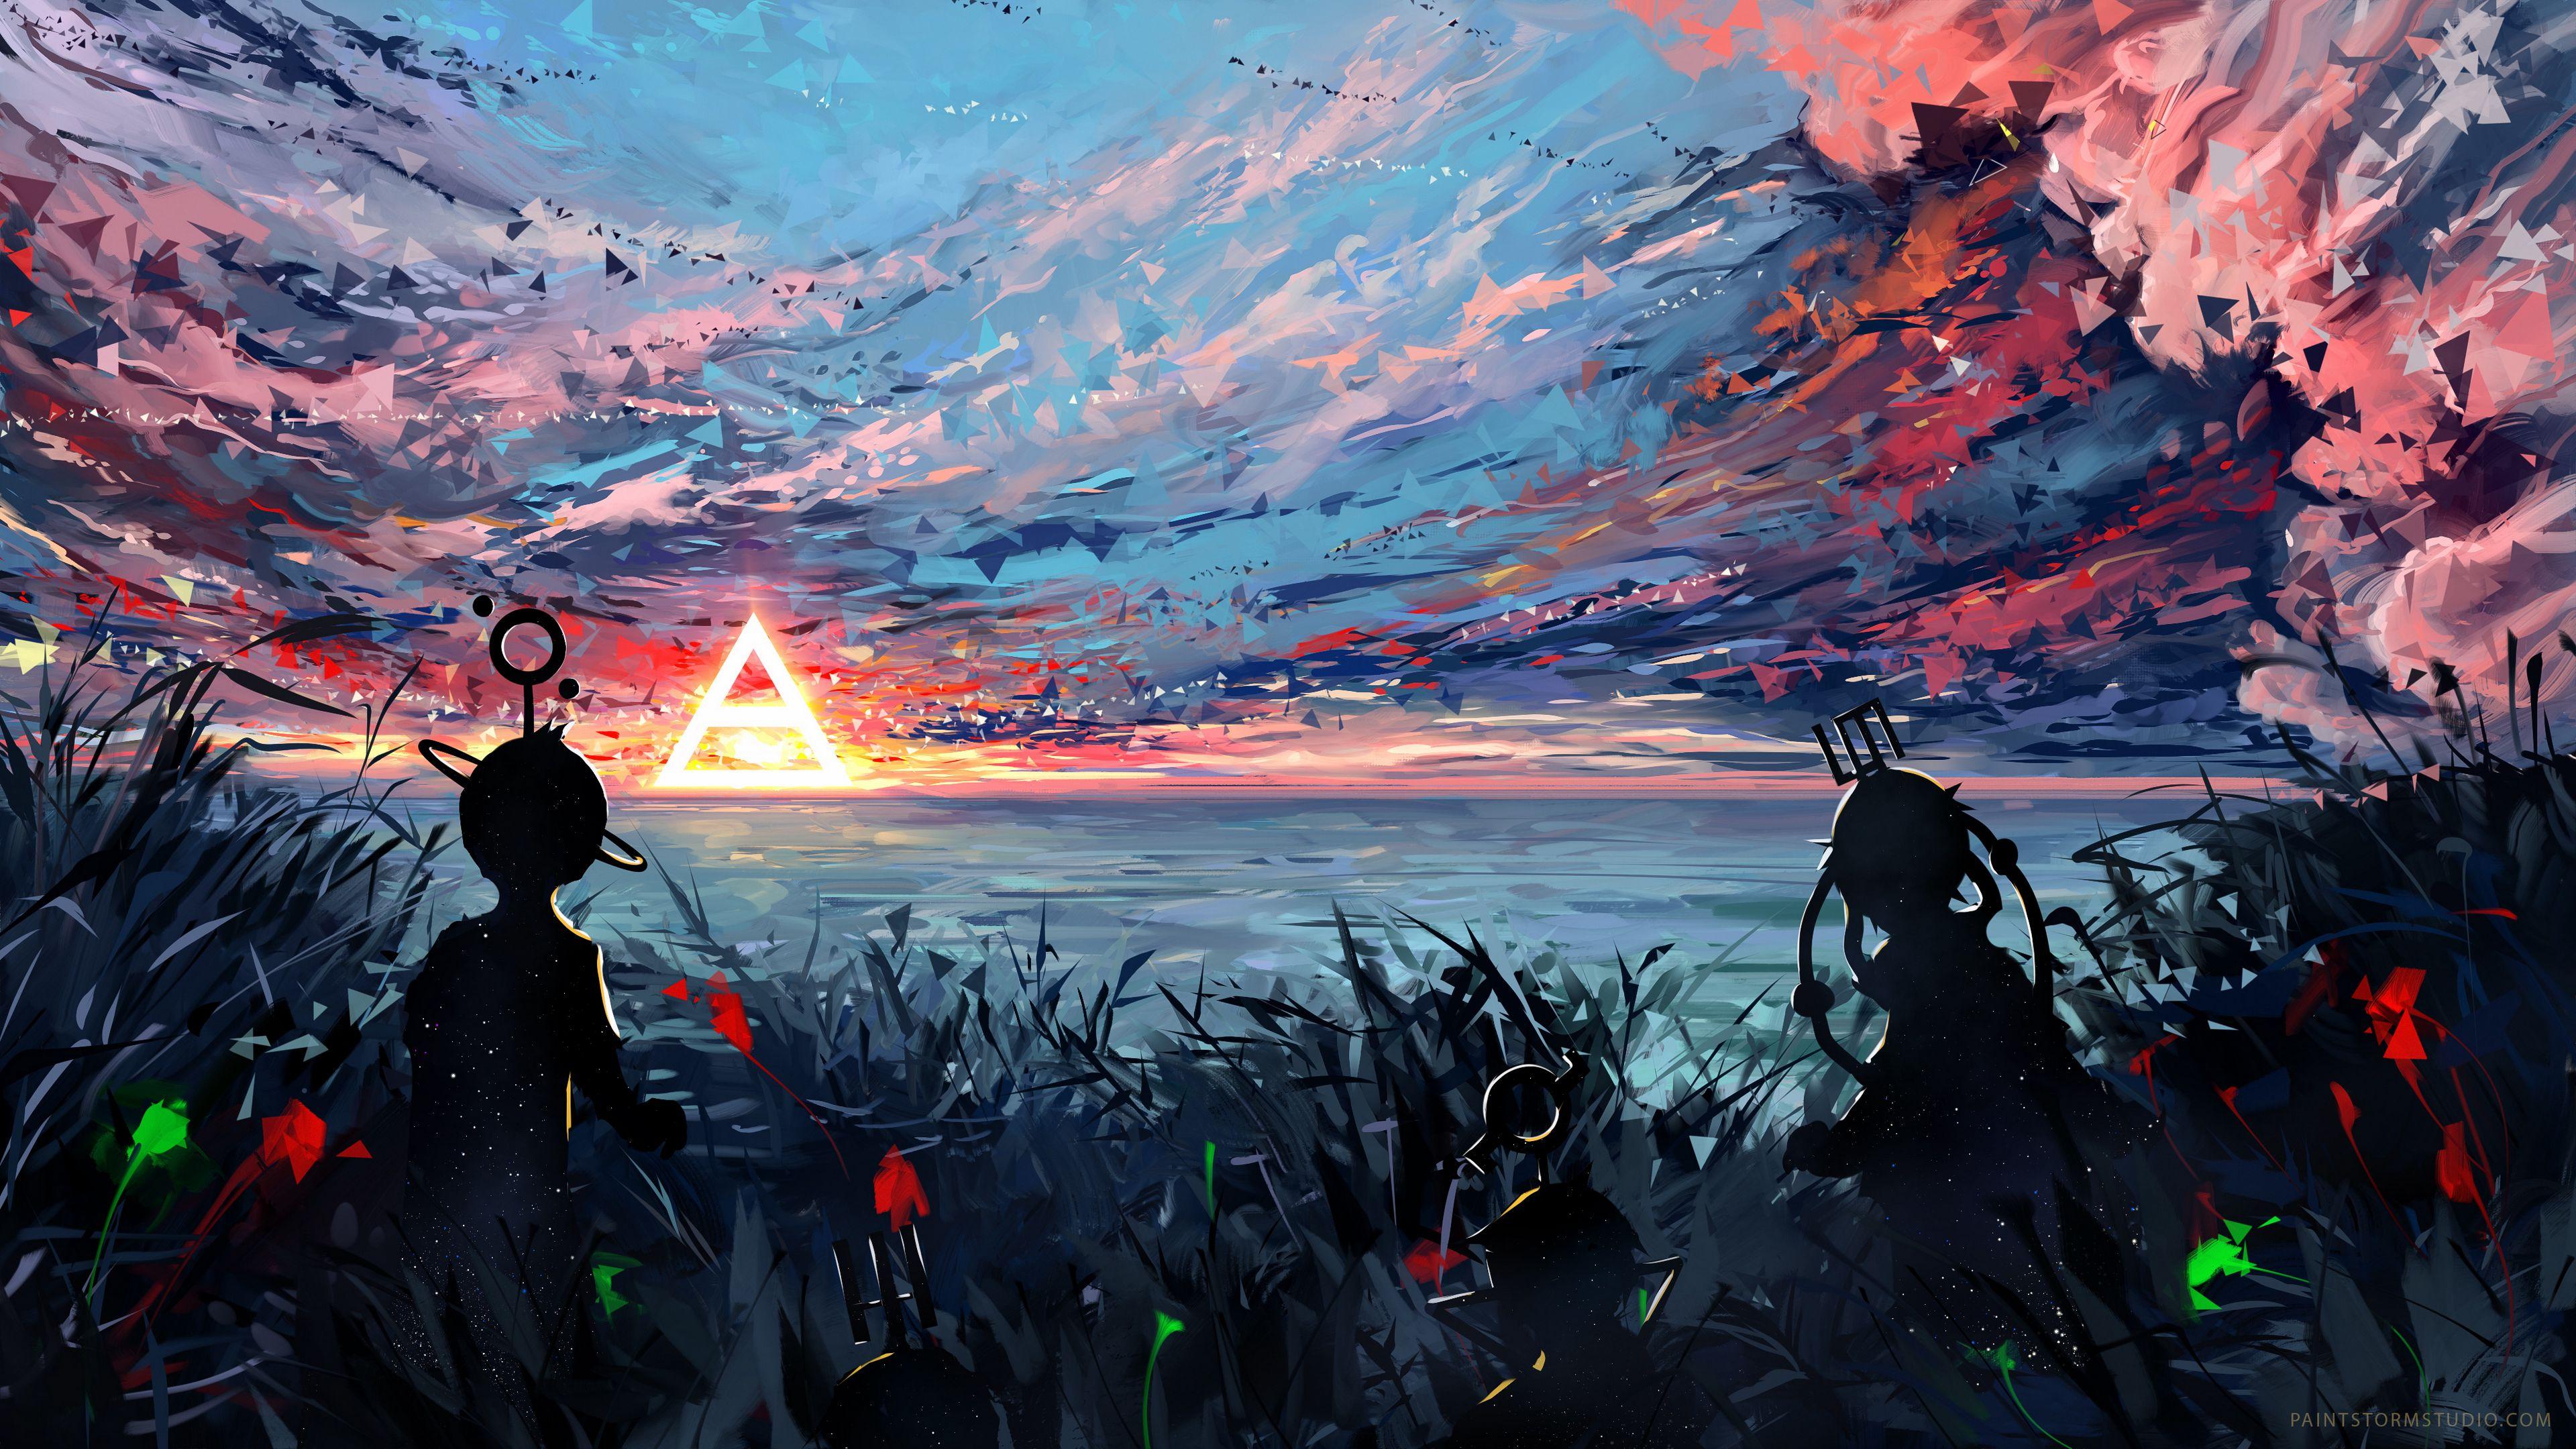 3840x2160 Wallpaper silhouette, art, sky, spots, colorful